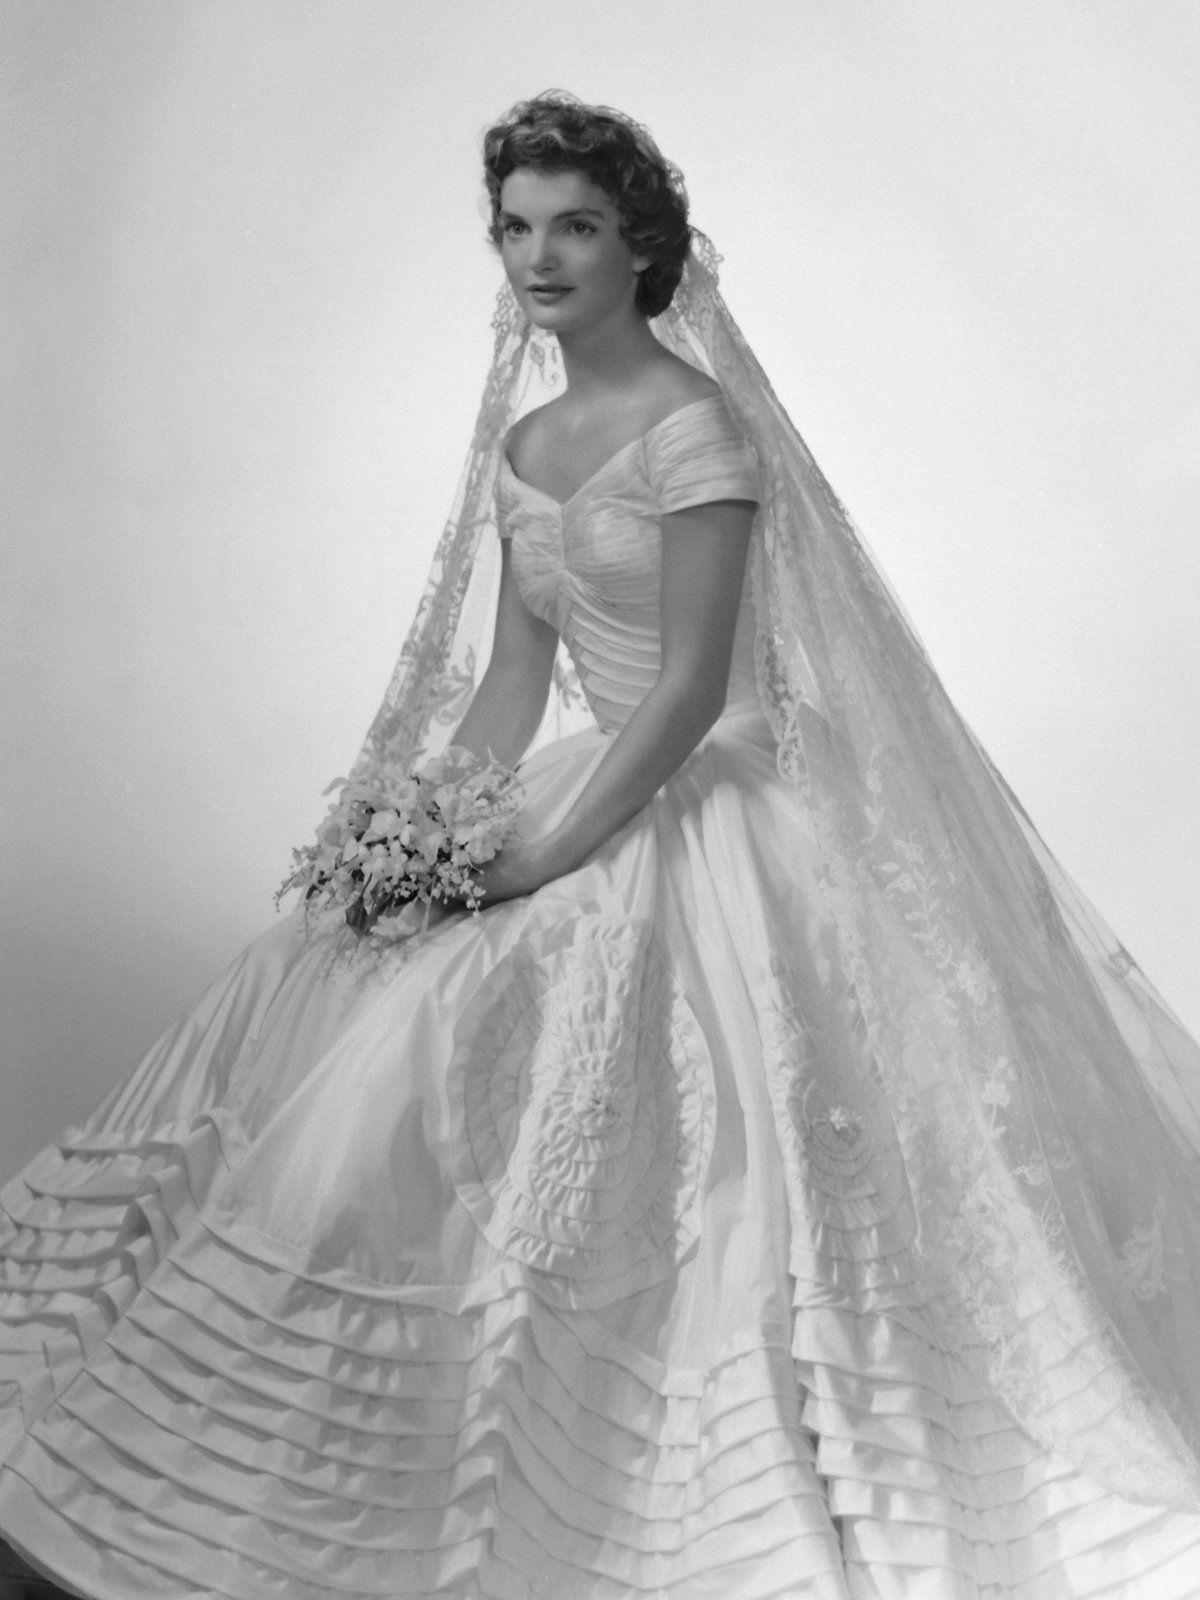 Vintage Brautkleider | Grey weddings, Vintage weddings and Weddings